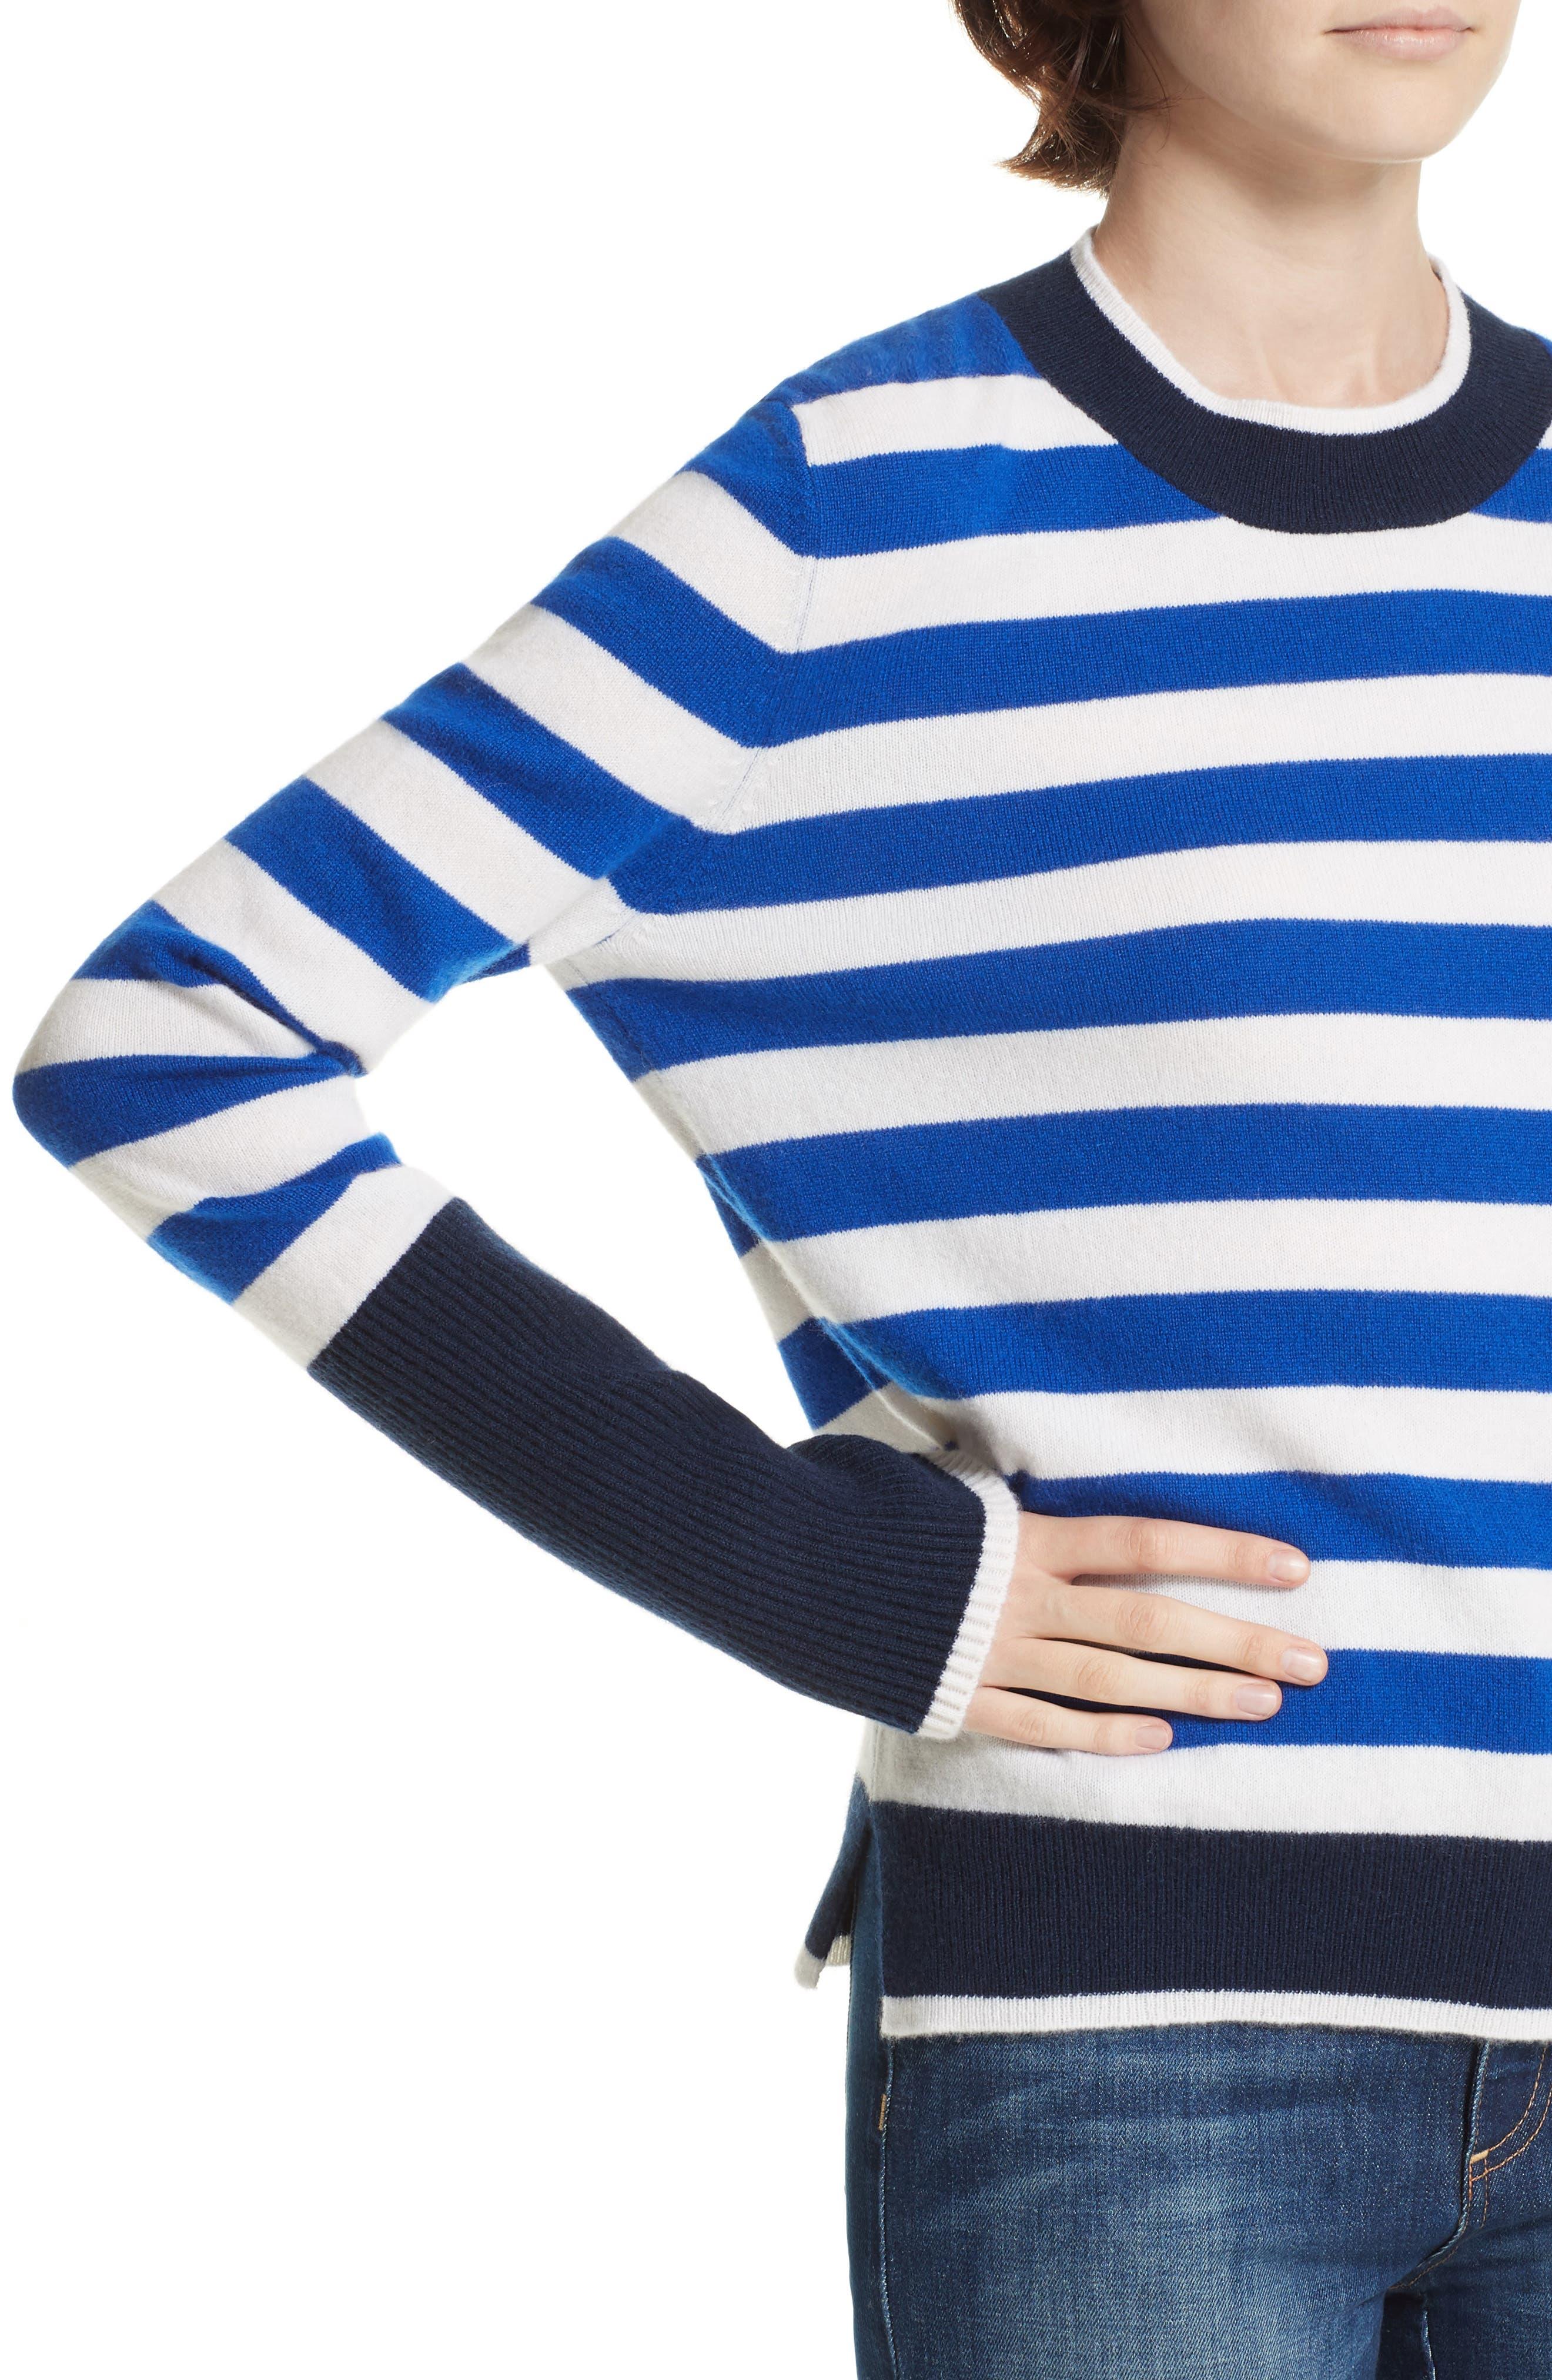 L'Universite Cashmere Sweater,                             Alternate thumbnail 4, color,                             BRIGHT BLUE/ CREAM/ NAVY